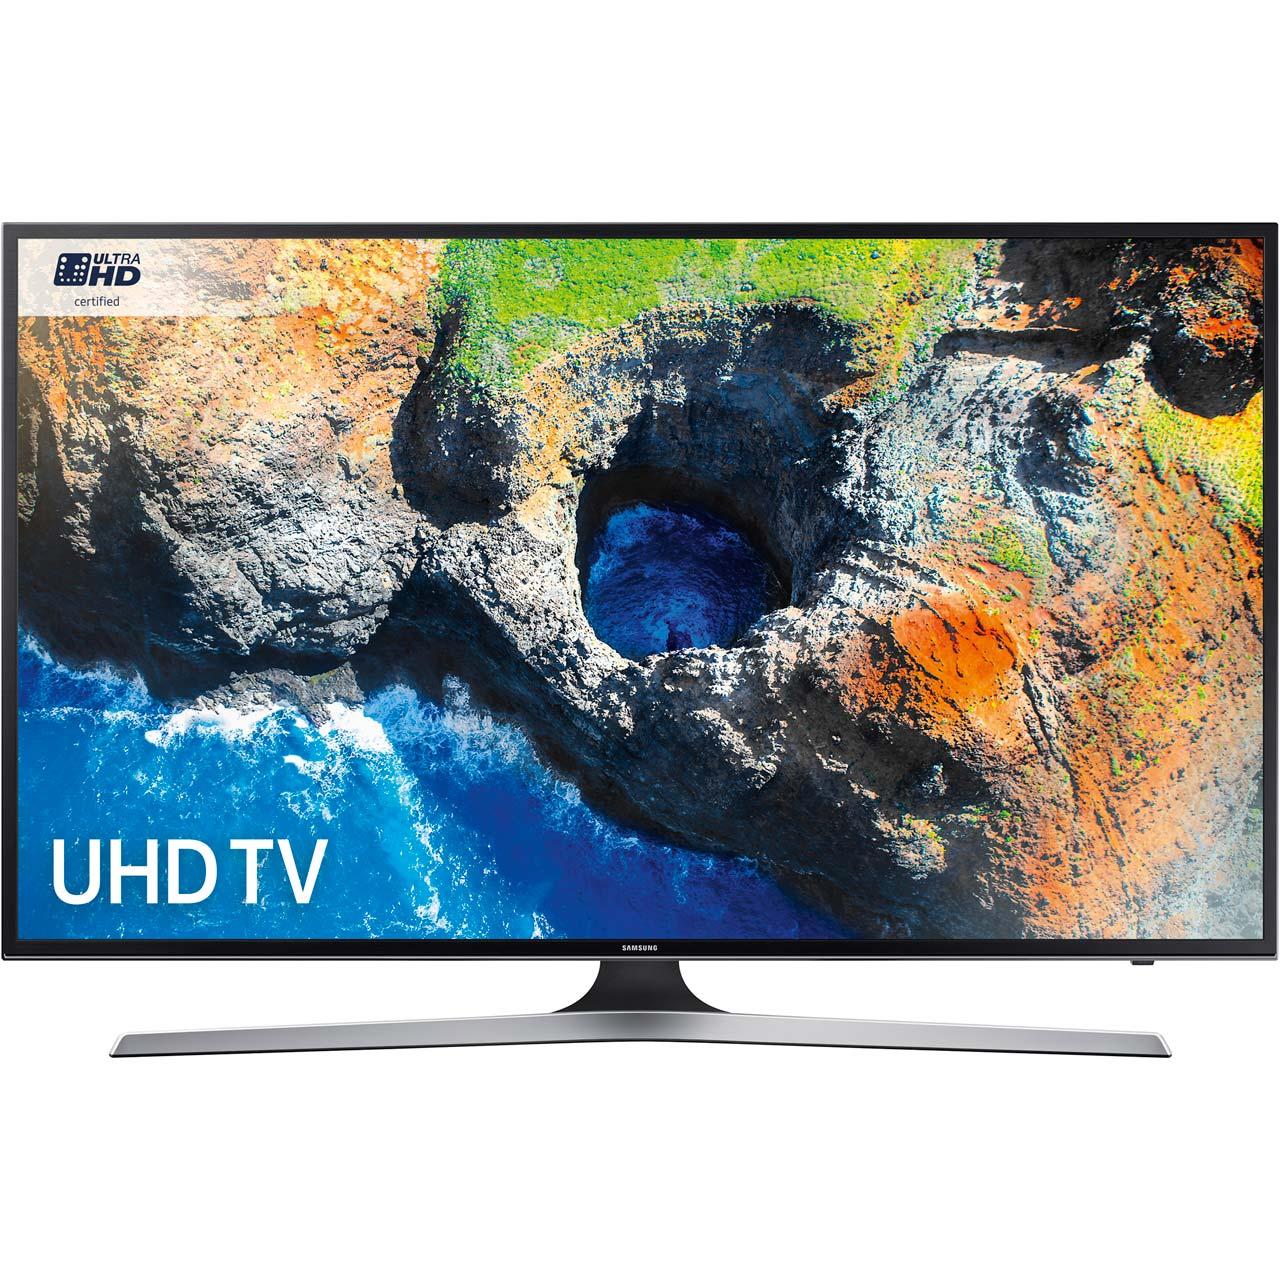 "Samsung UE50MU6120 50"" Smart 4K Ultra HD with HDR TV £439 - ao.com"